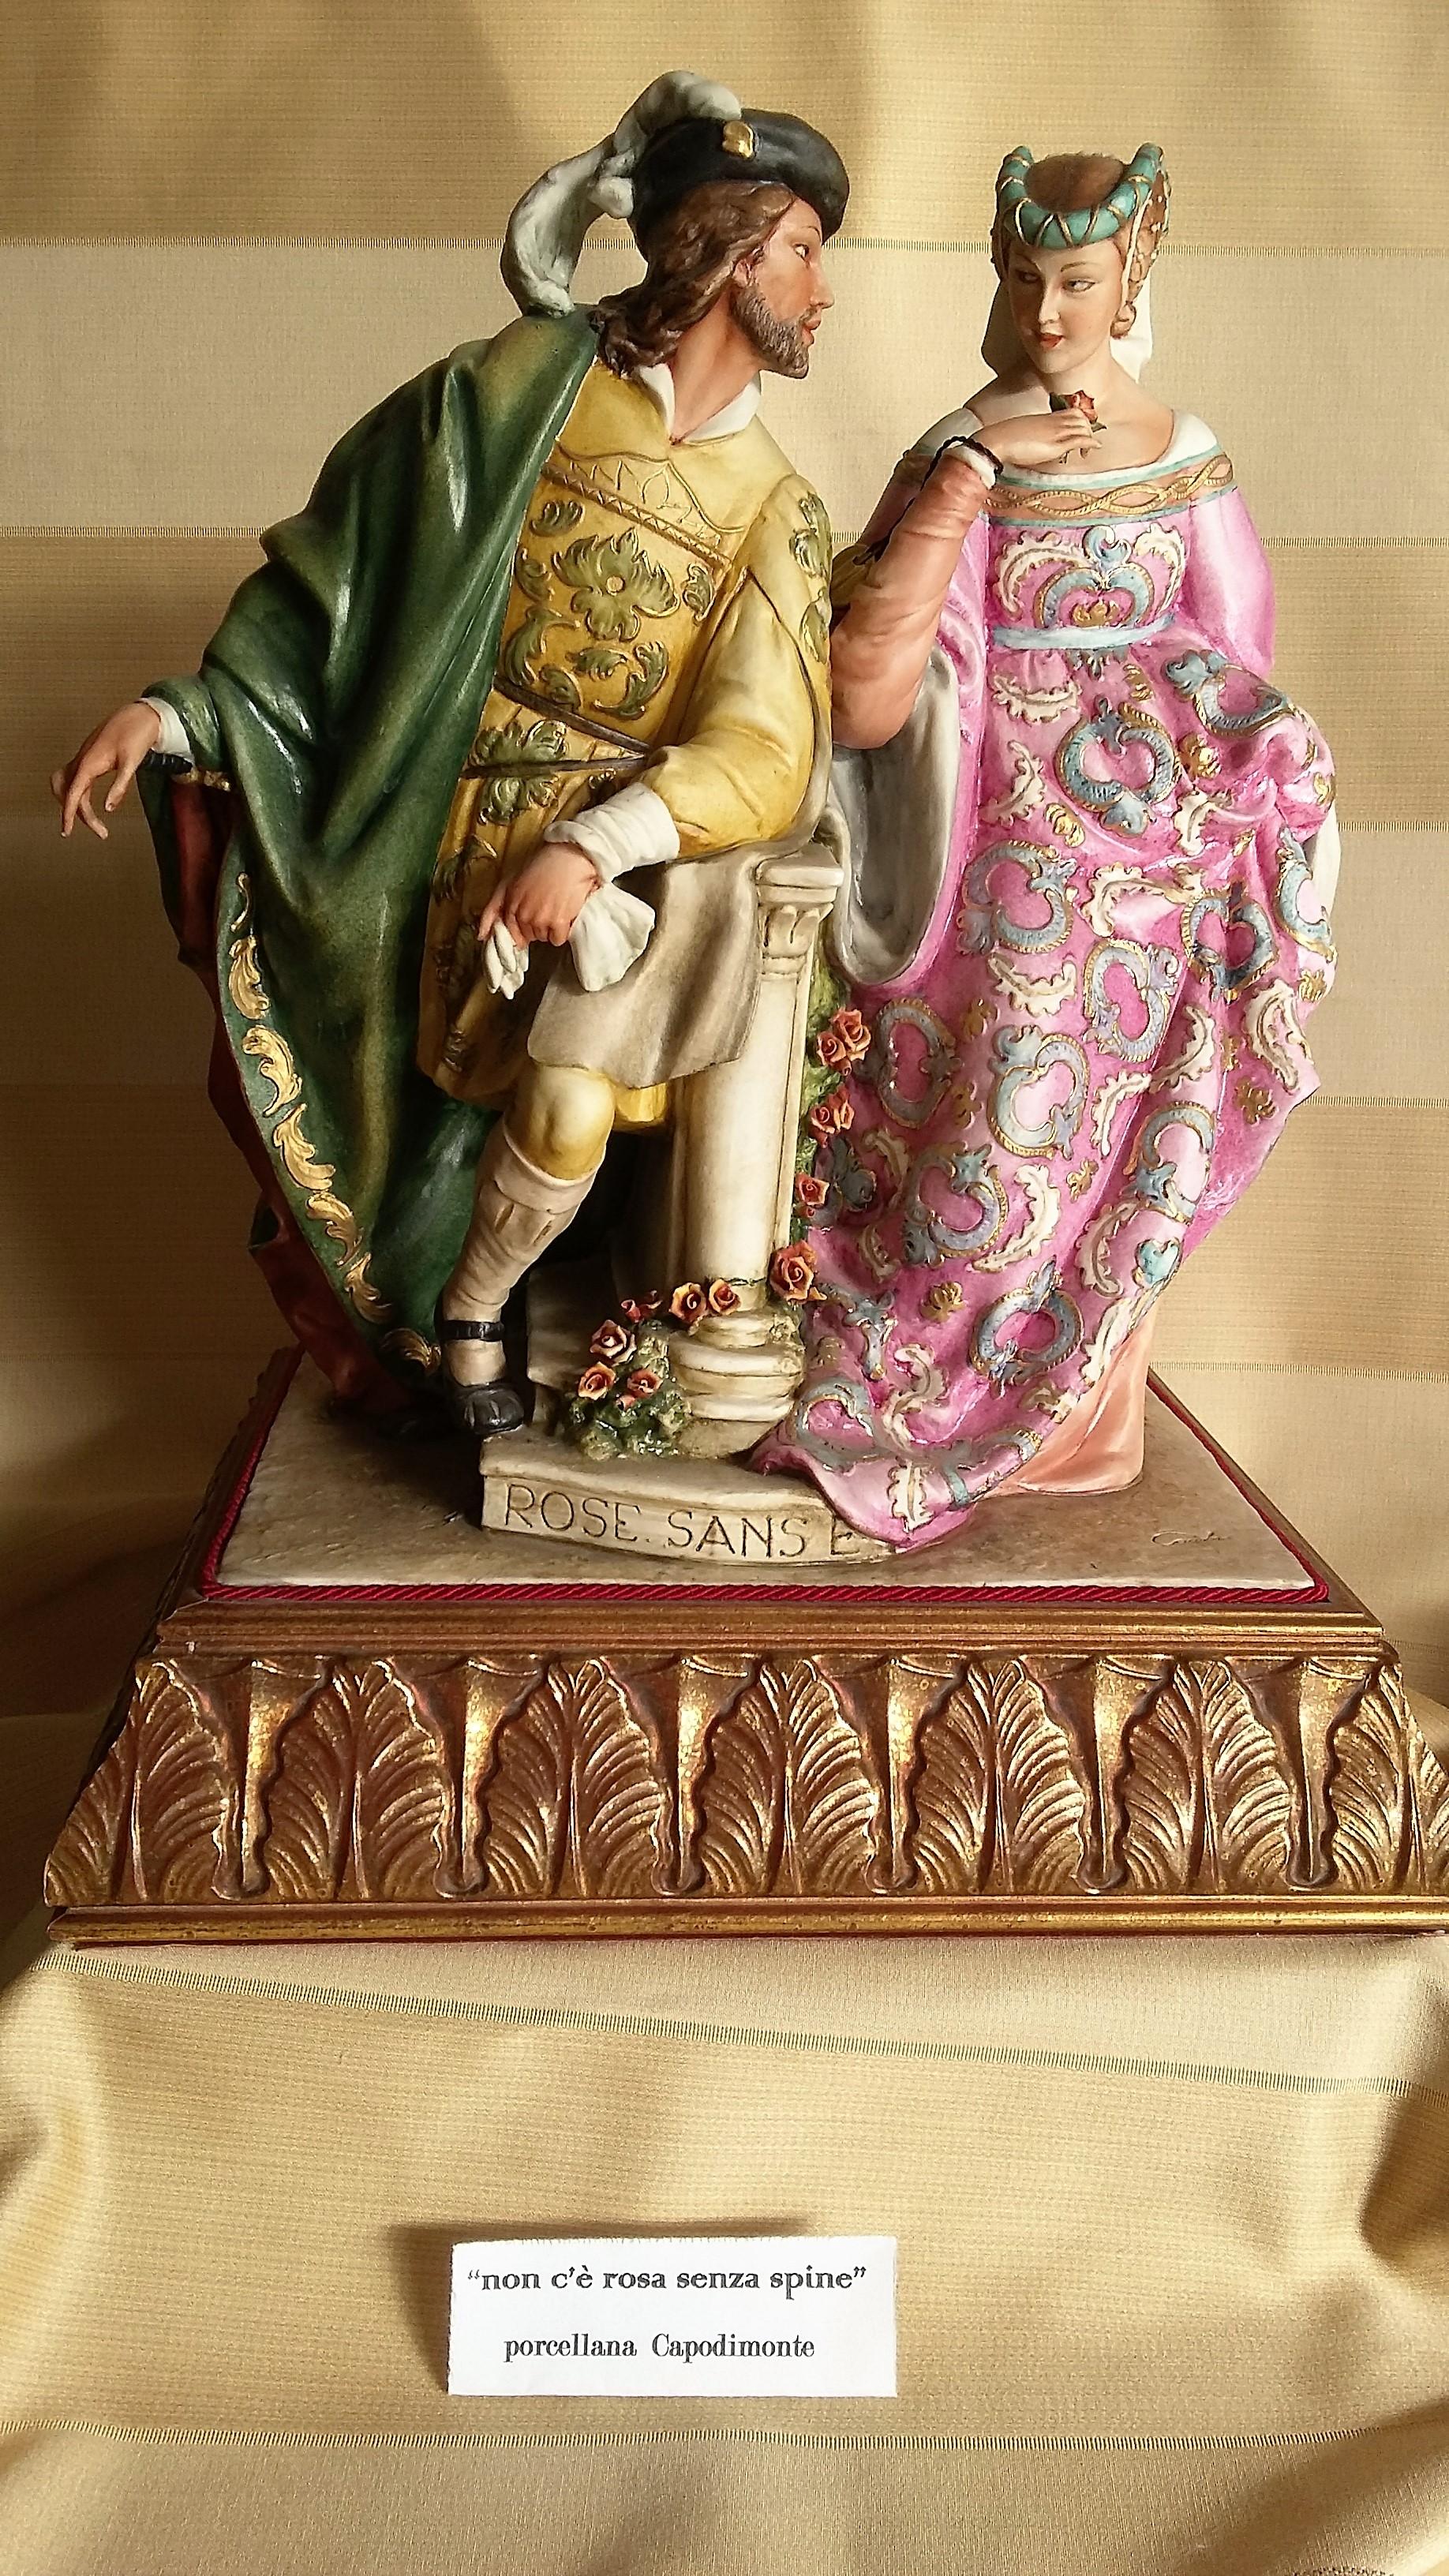 Non c rosa senza spine artigianato veneto mobili d 39 arte - Fabbriche mobili veneto ...